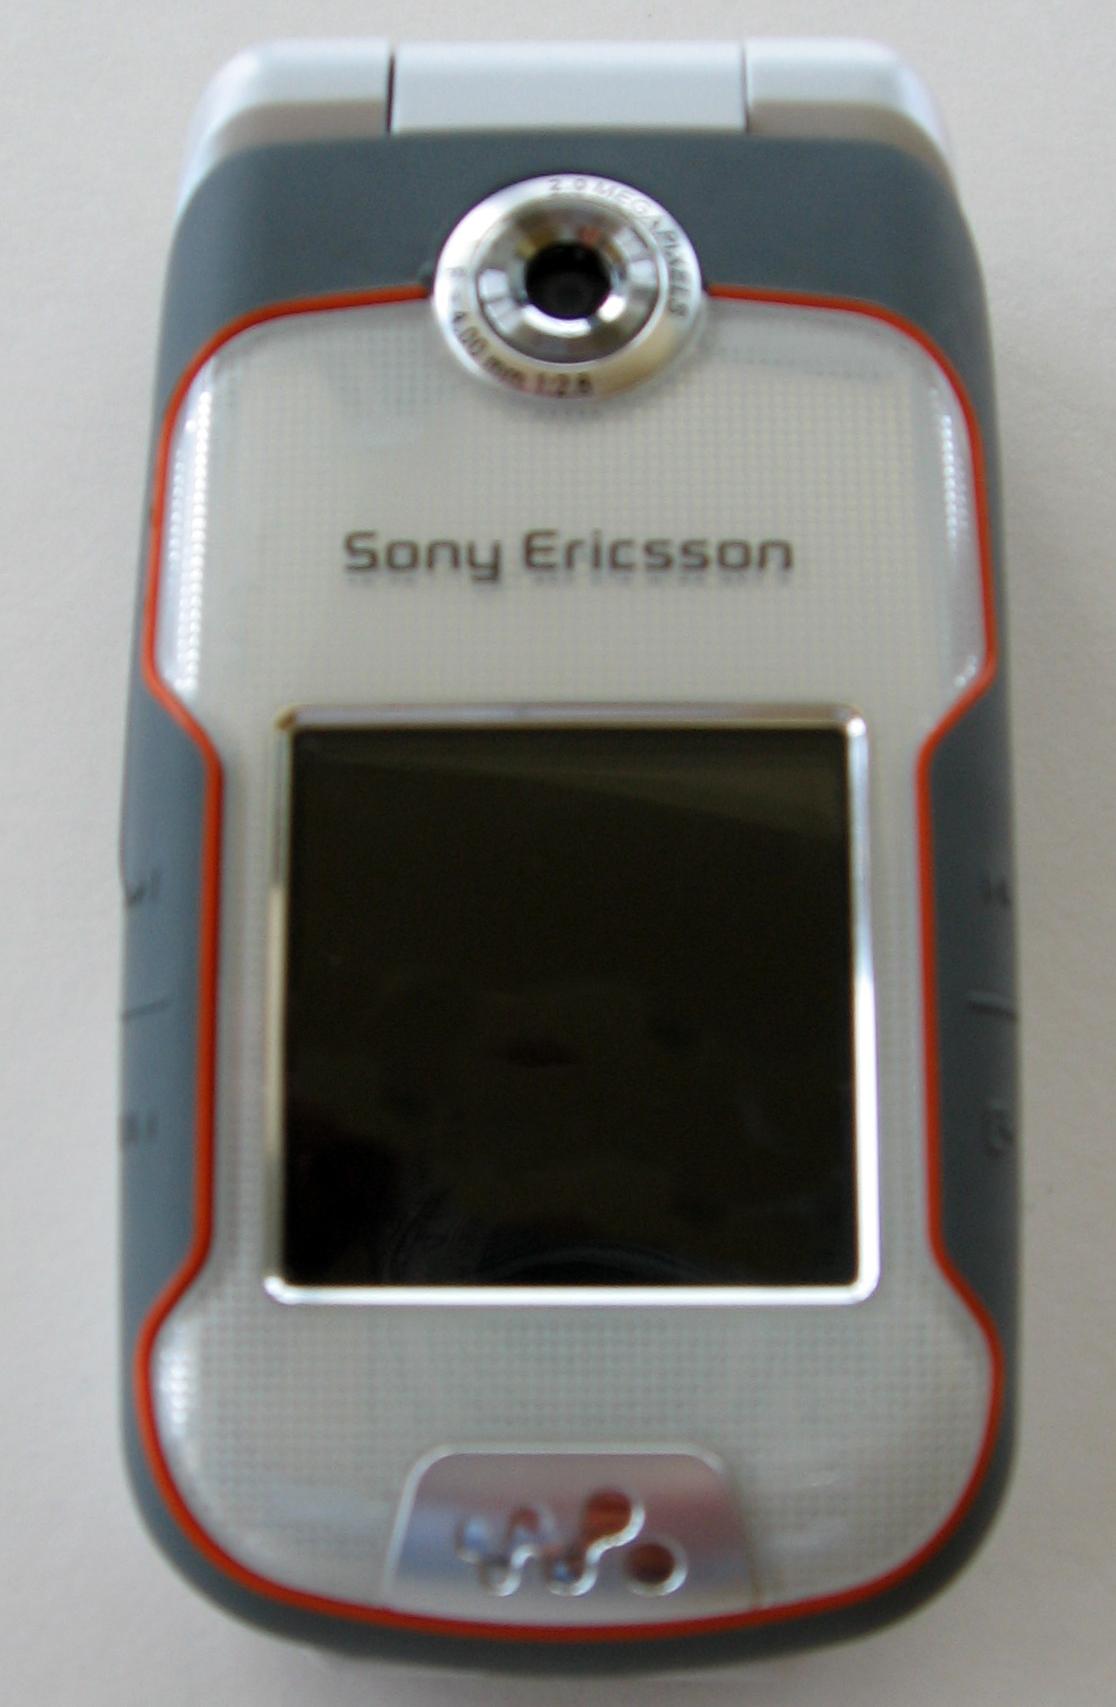 Sony Ericsson W710 - Wikipedia, the free encyclopedia